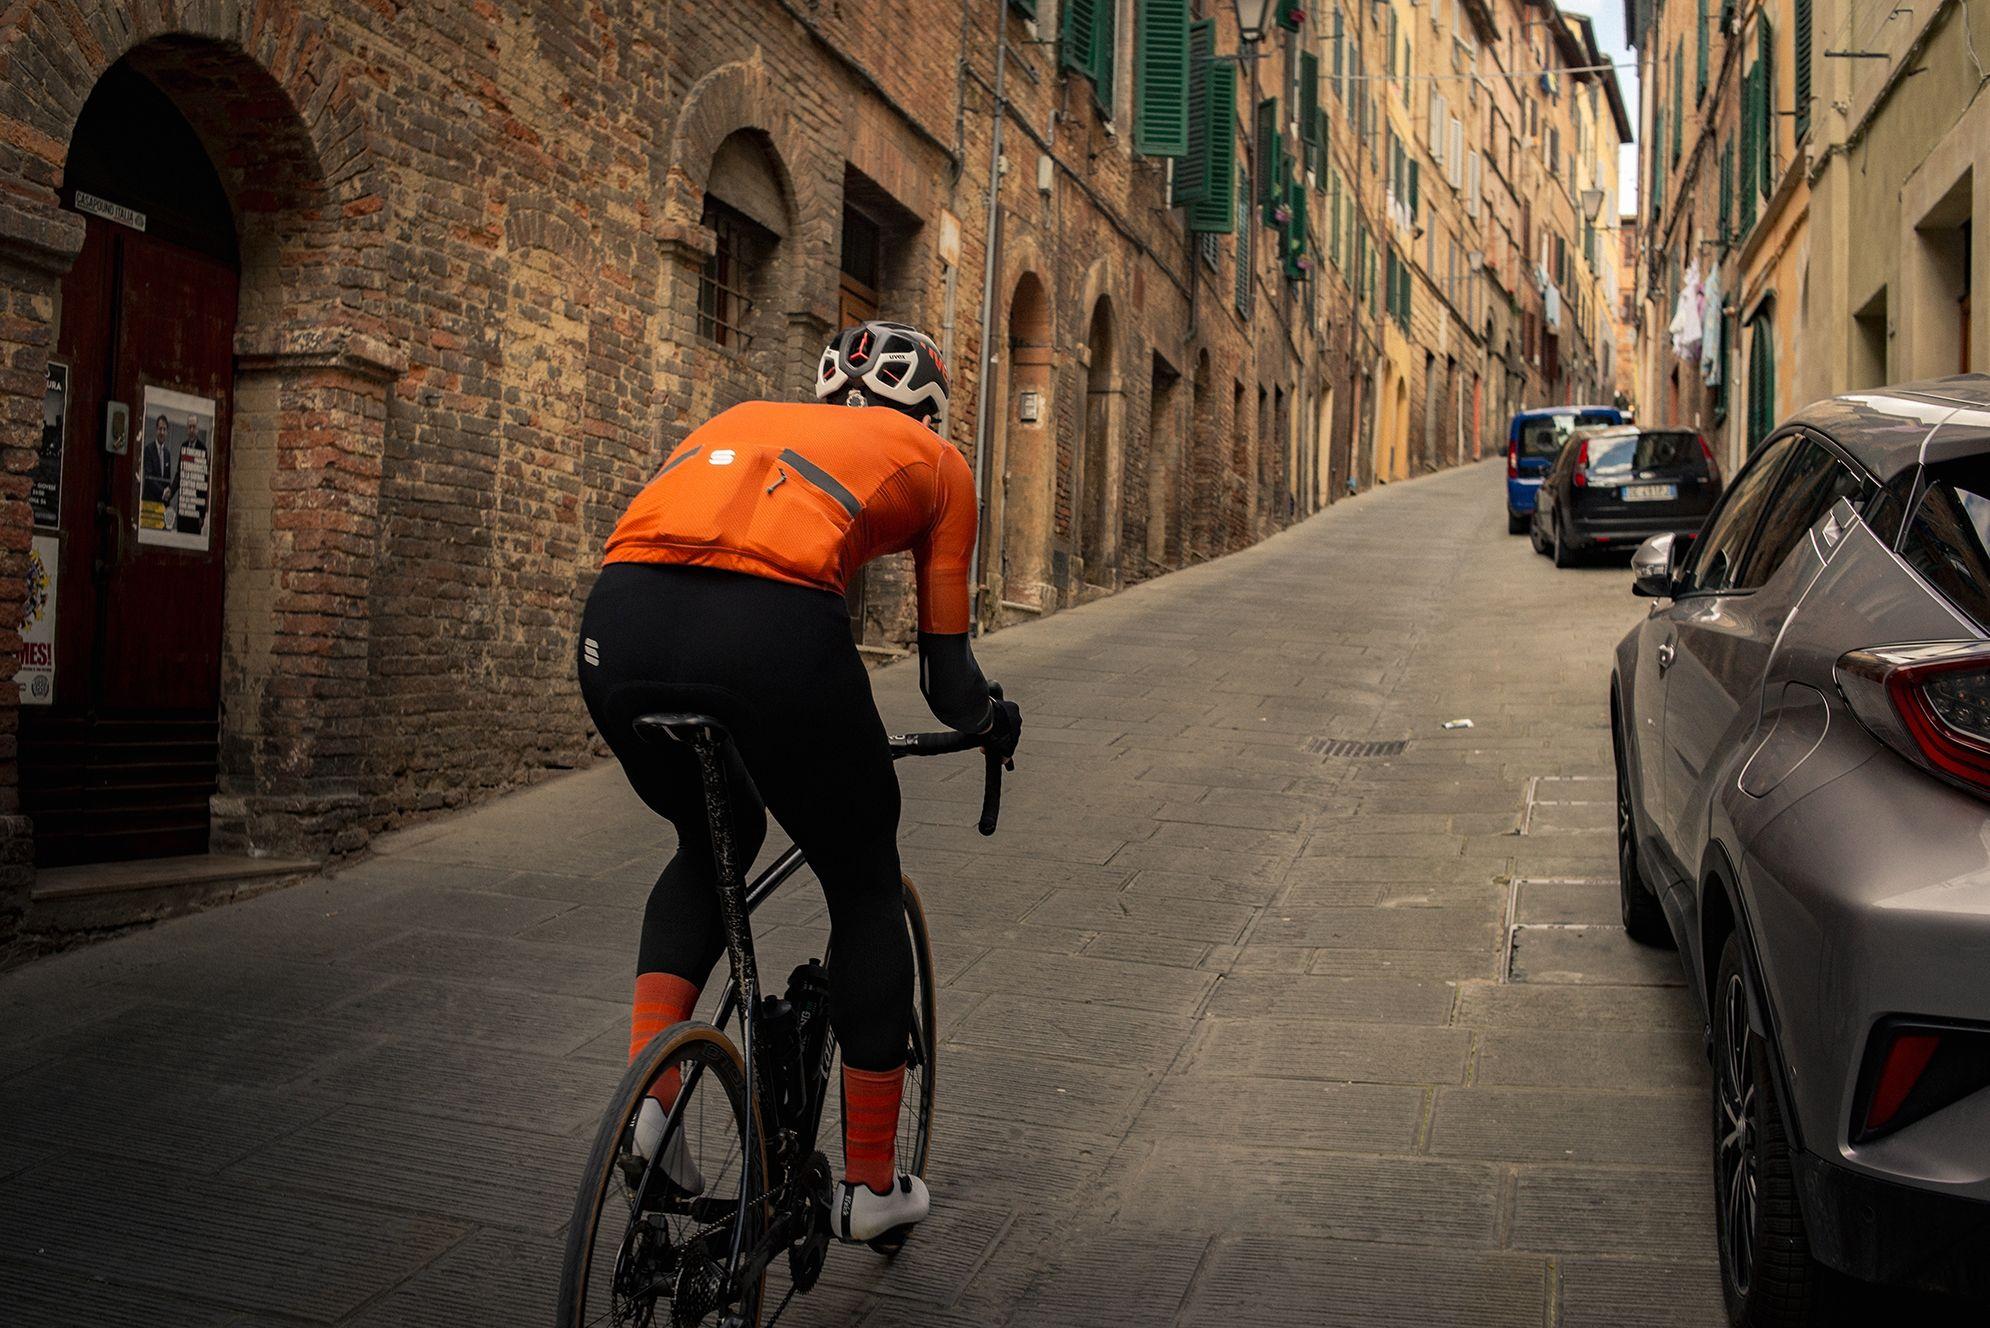 Strade Bianche aankomst Siena